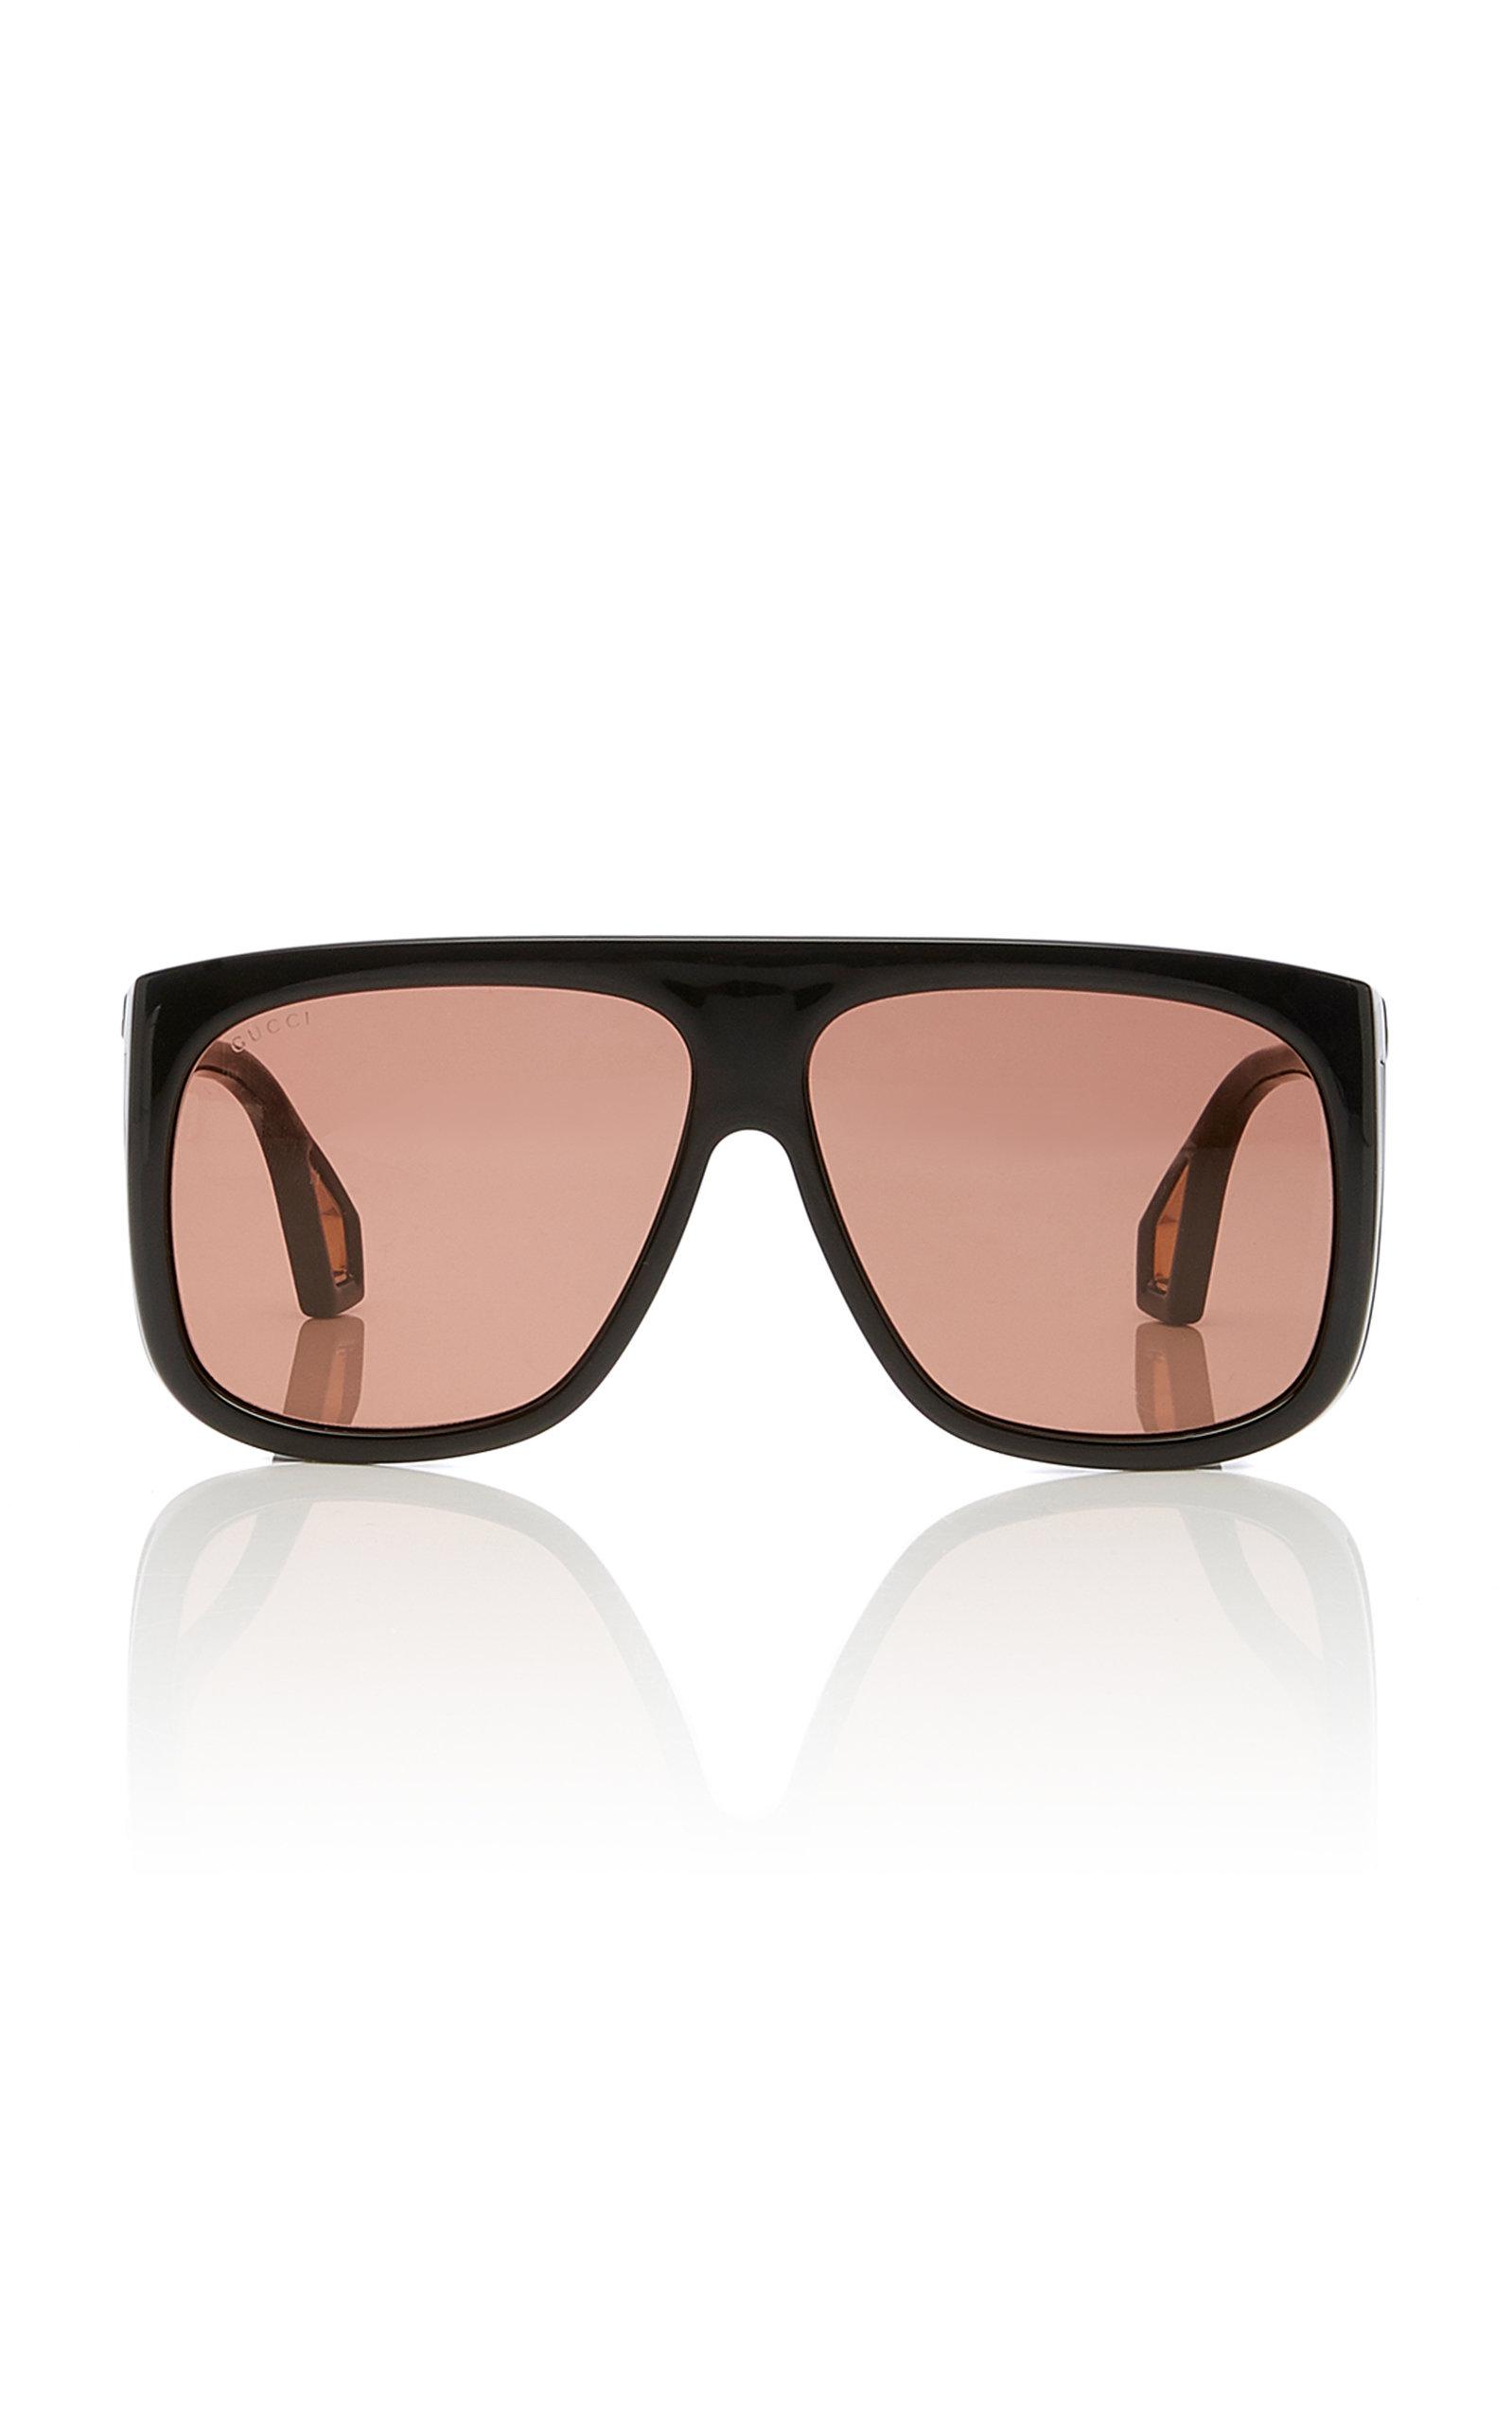 7b9d3b230c4fa Square-Frame Acetate Sunglasses by Gucci Sunglasses